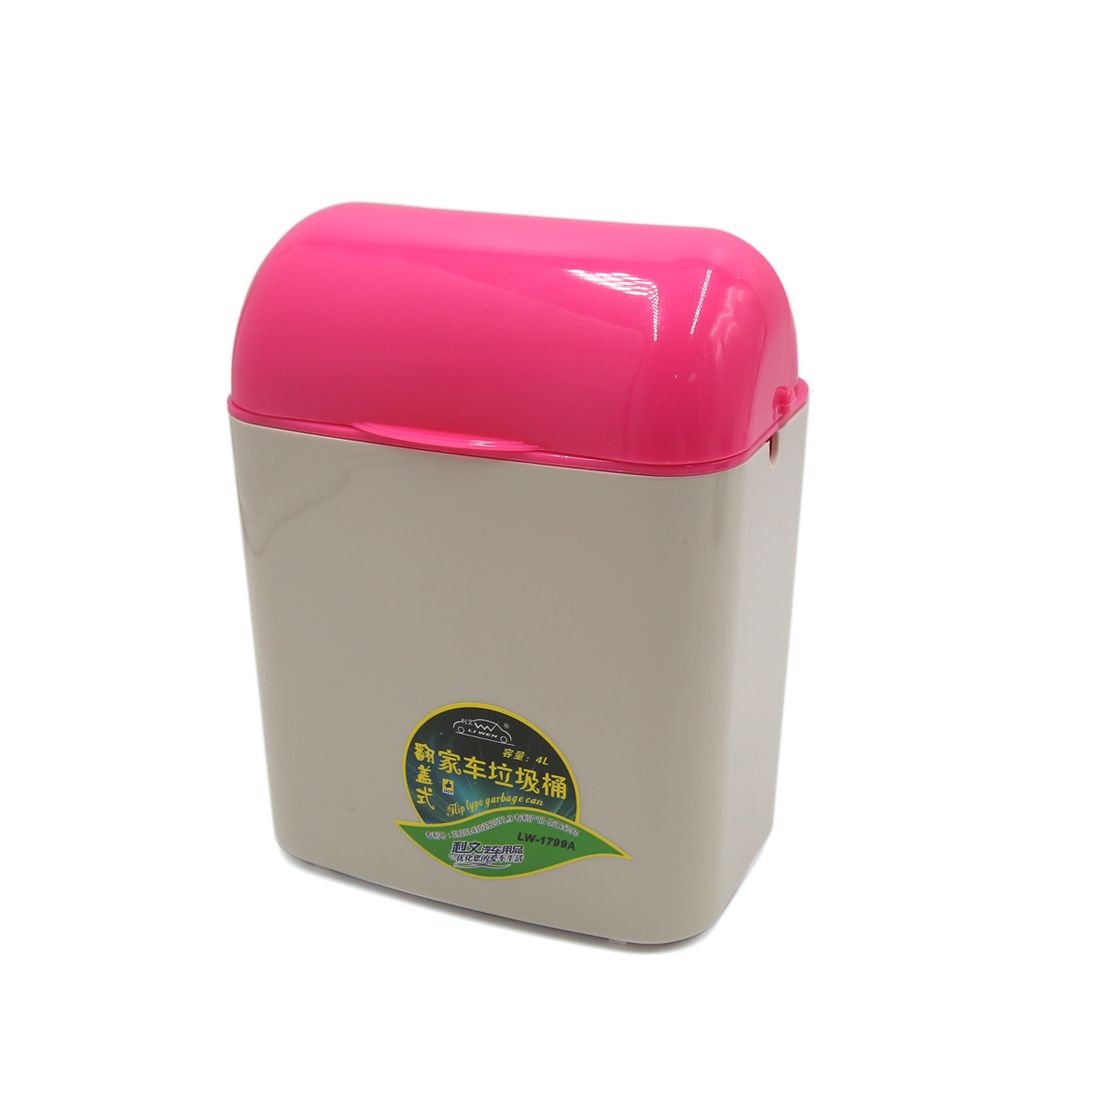 Red Khaki Plastic Rubbish Trash Bin Car Home Garbage Dustbin Box Case Holder